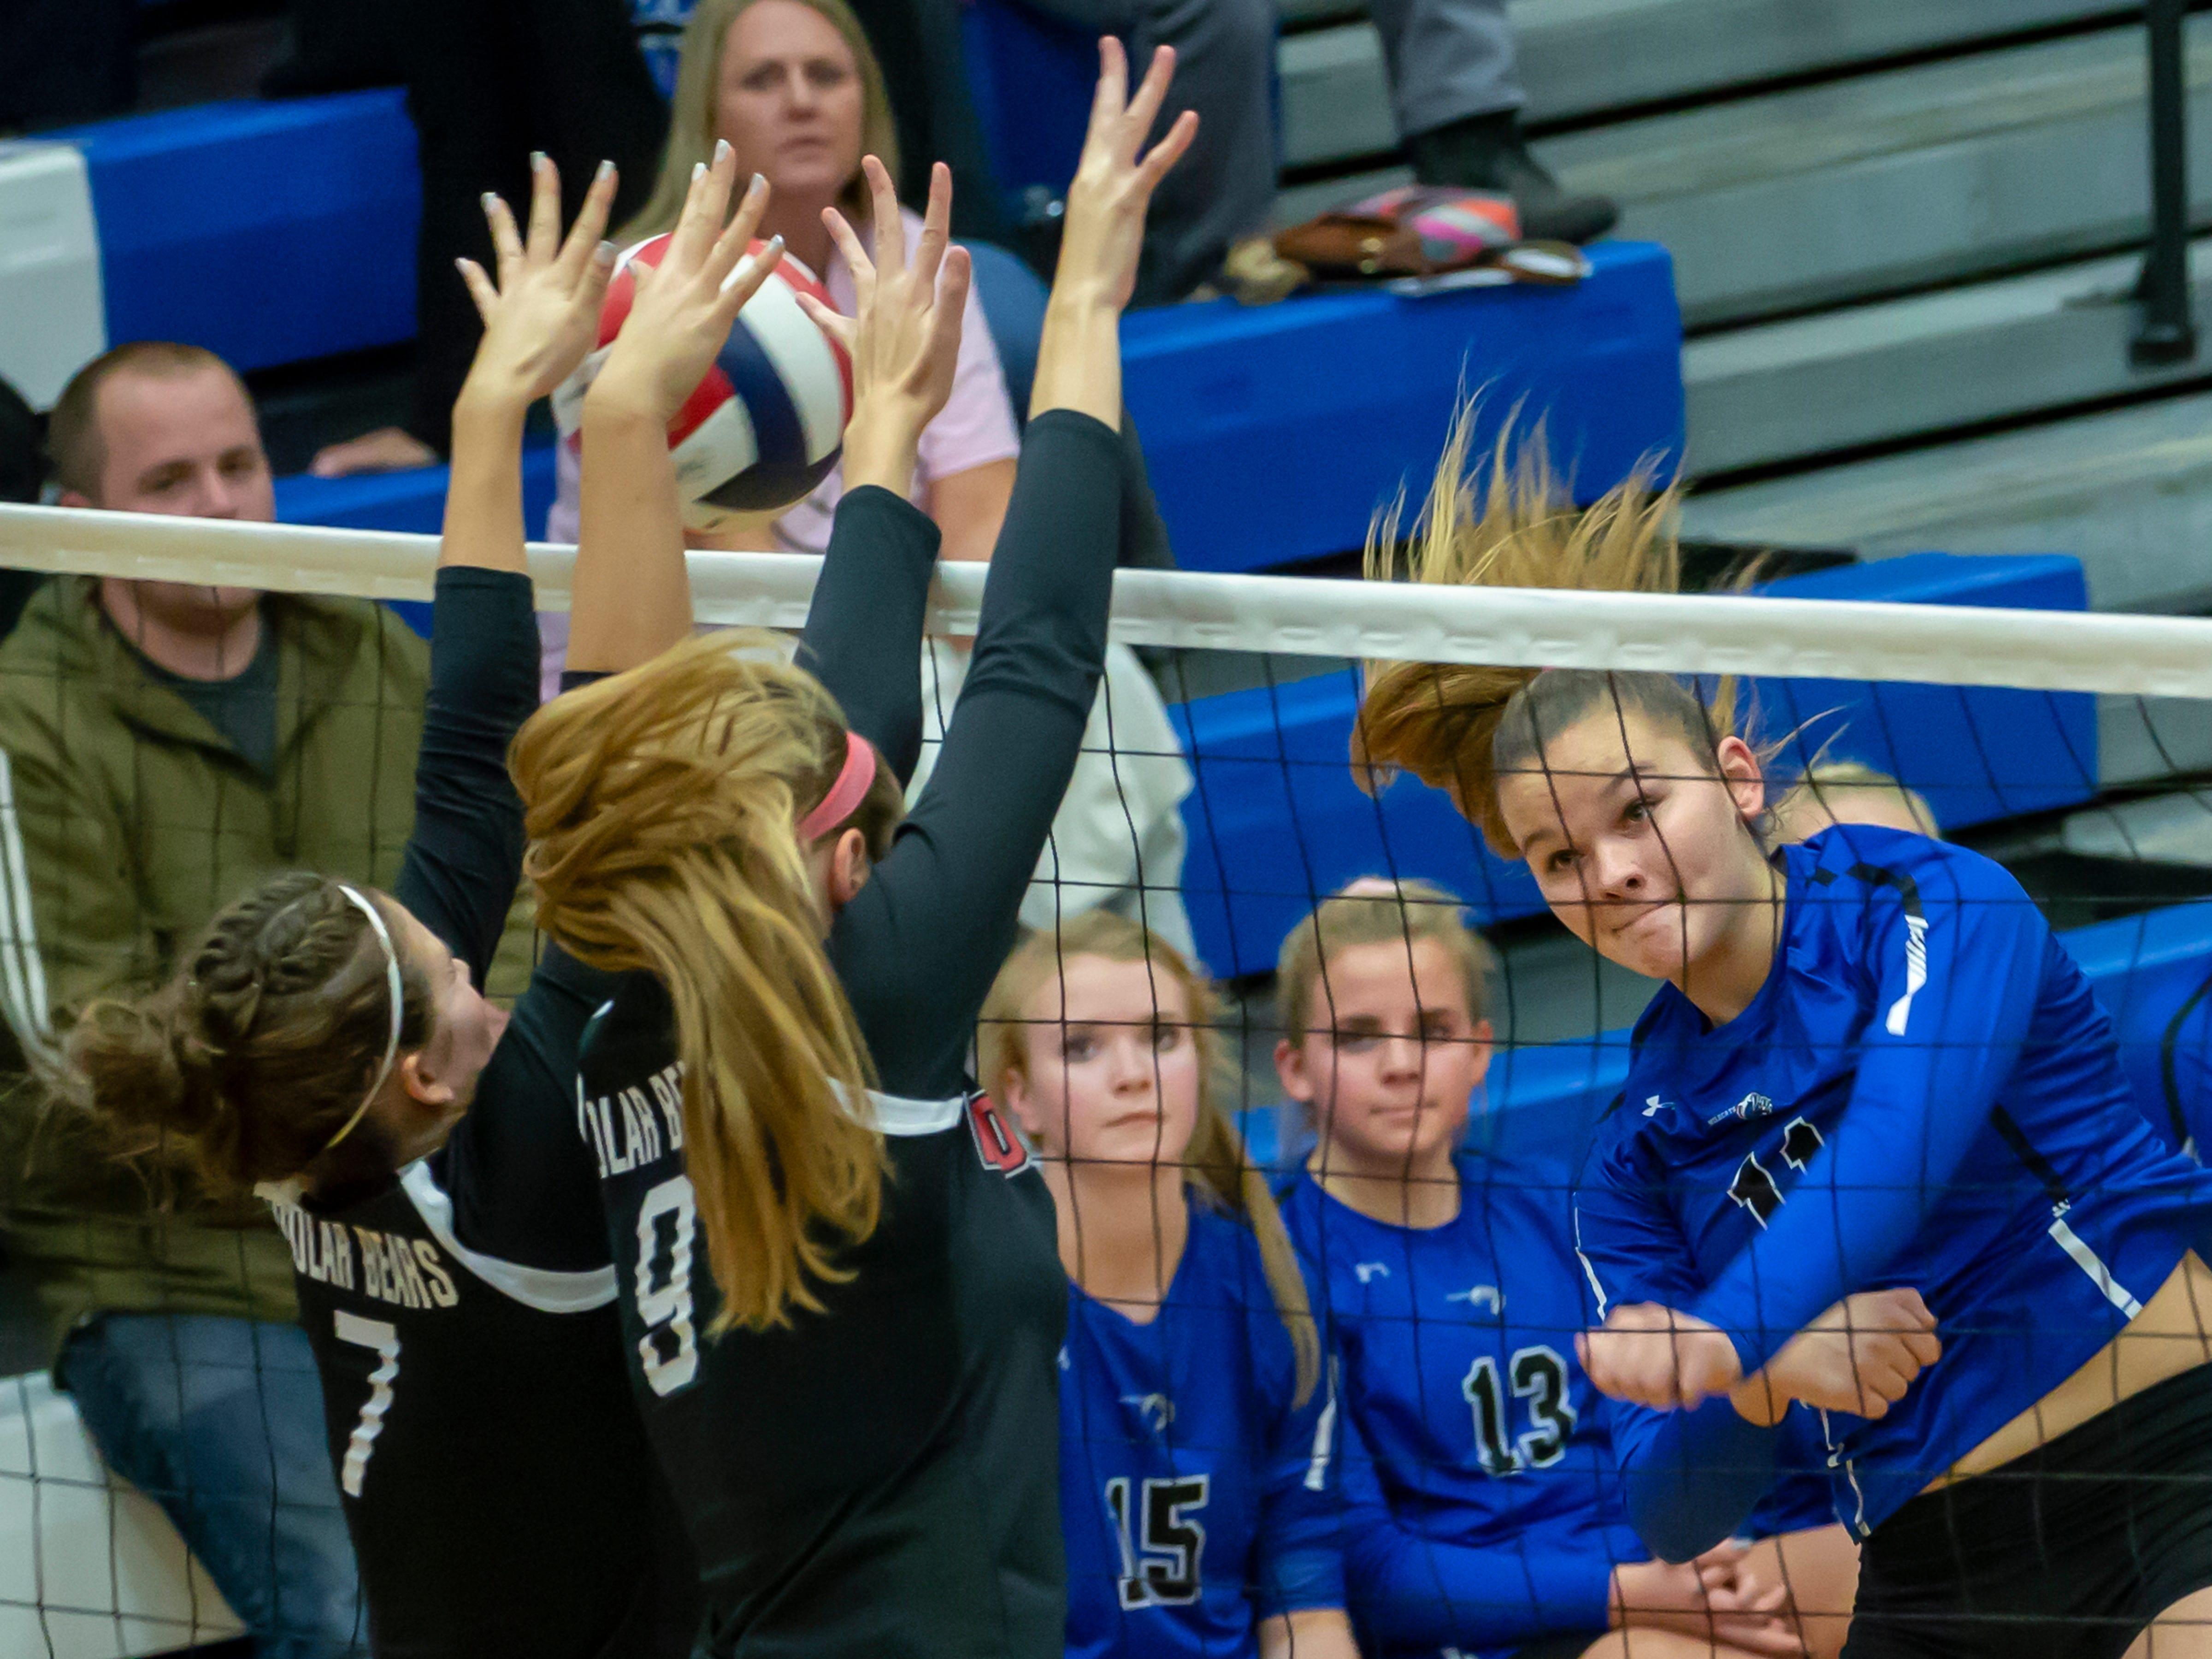 Oshkosh West's Morgan Yenter attempts a shot past Hortonville blockers Haily Meyer and Adrianne Hagen playing at Oshkosh West High School on Thursday, October 11, 2018.